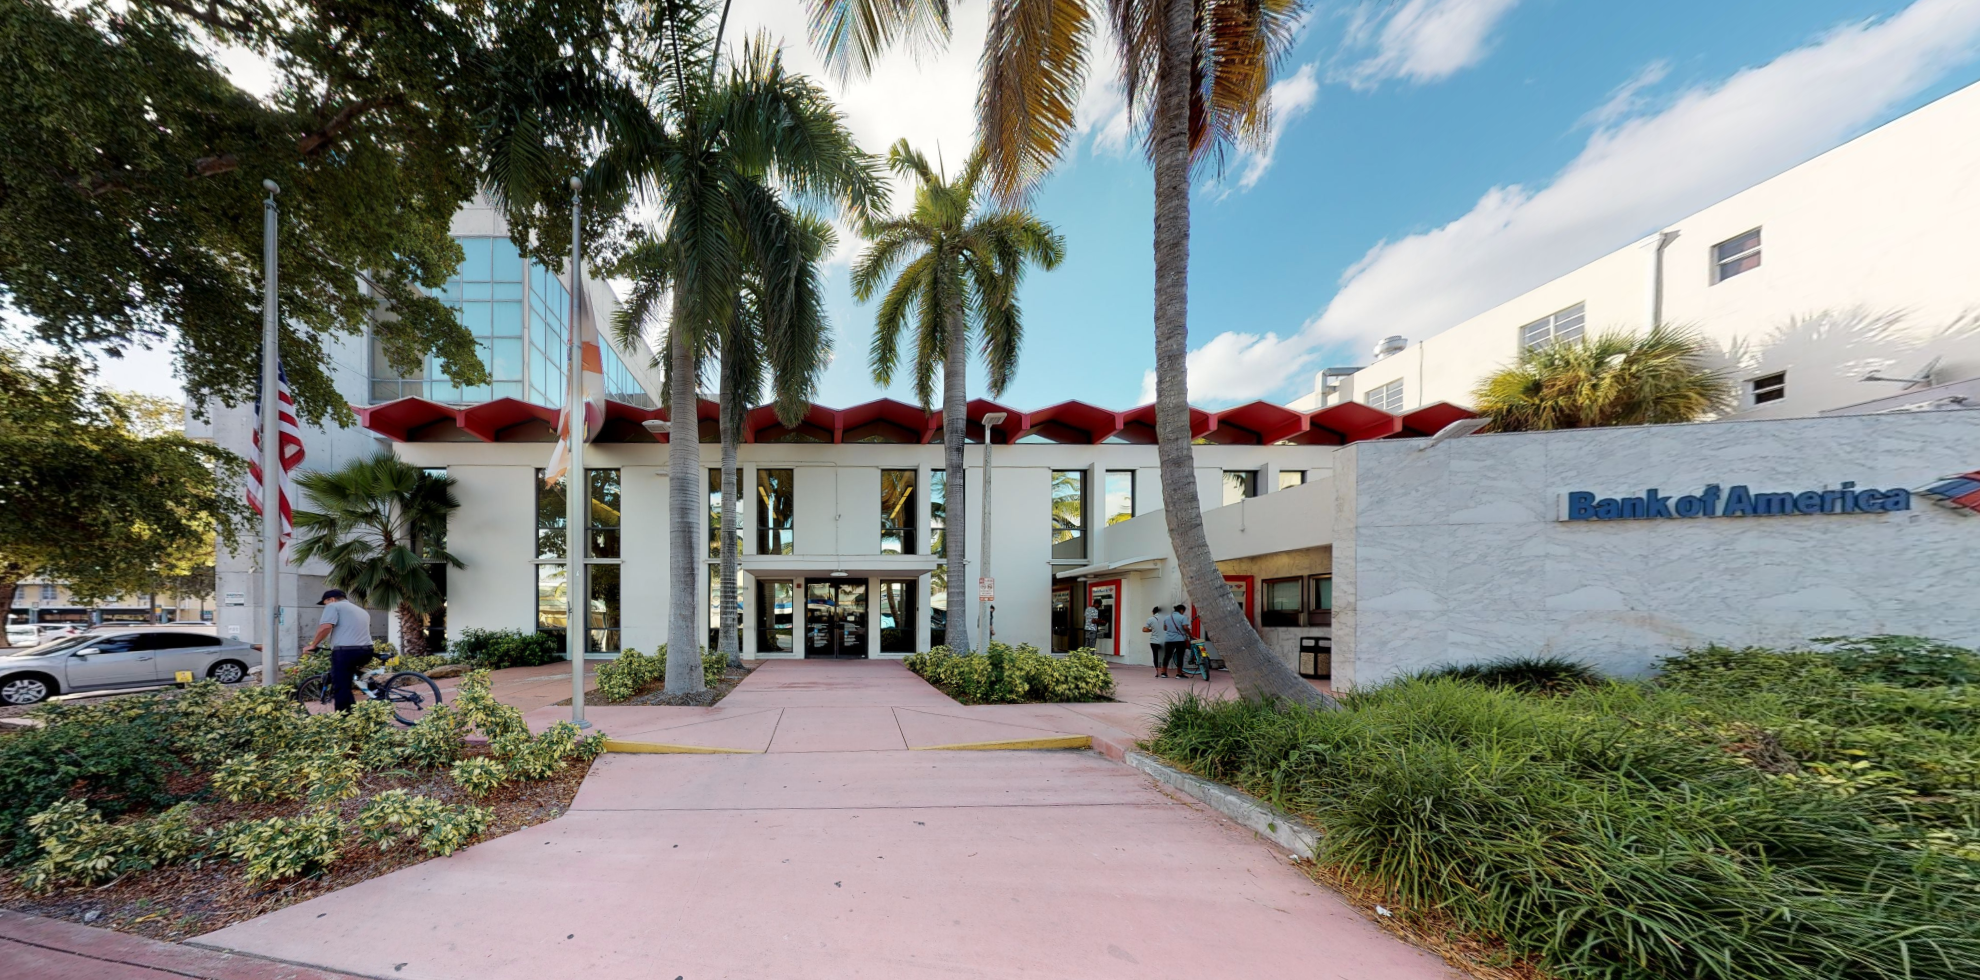 Bank of America financial center with drive-thru ATM | 930 Washington Ave, Miami Beach, FL 33139